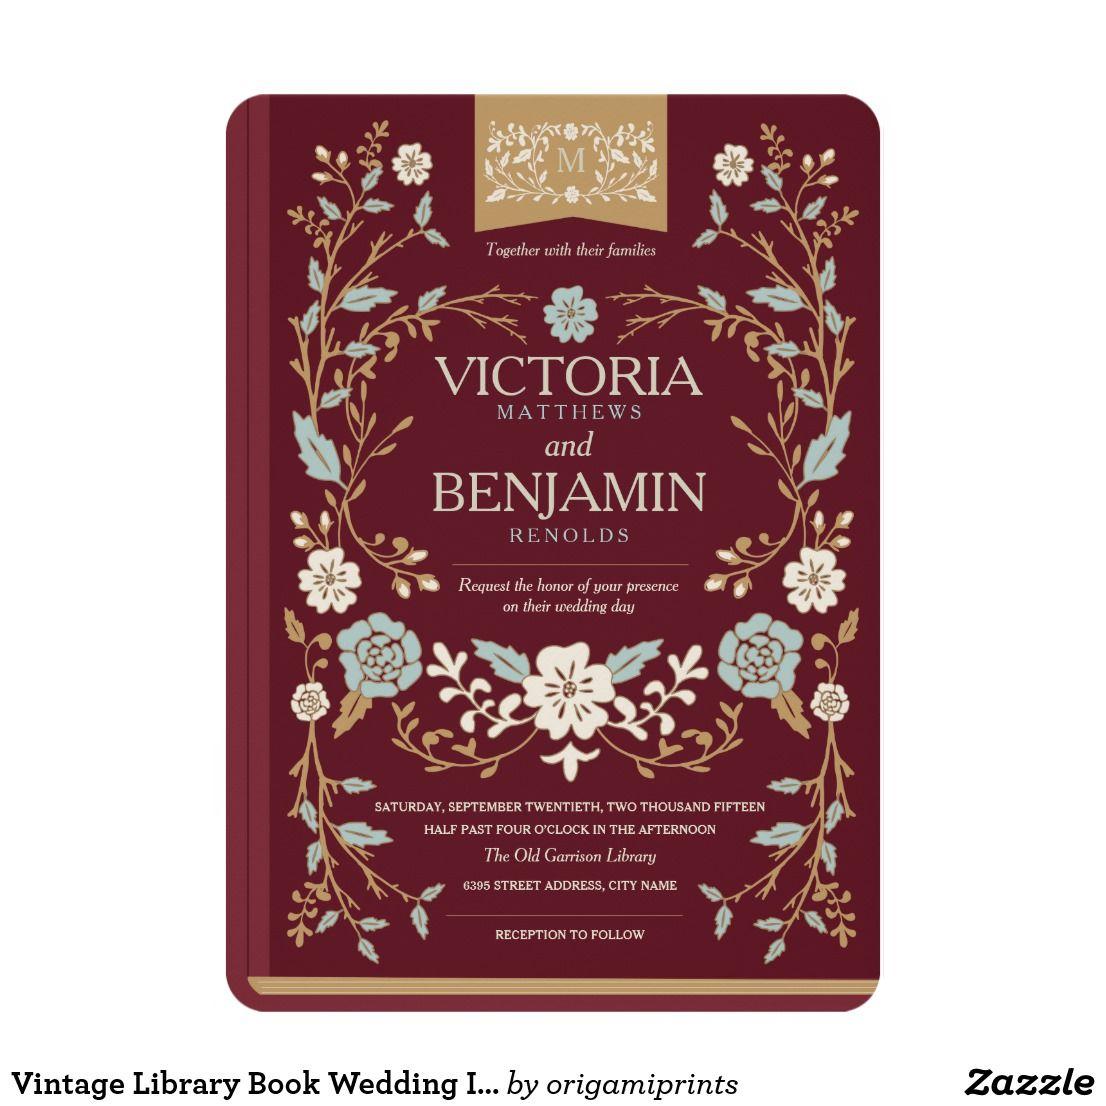 Vintage Library Book Wedding Invite | Pinterest | Vintage library ...